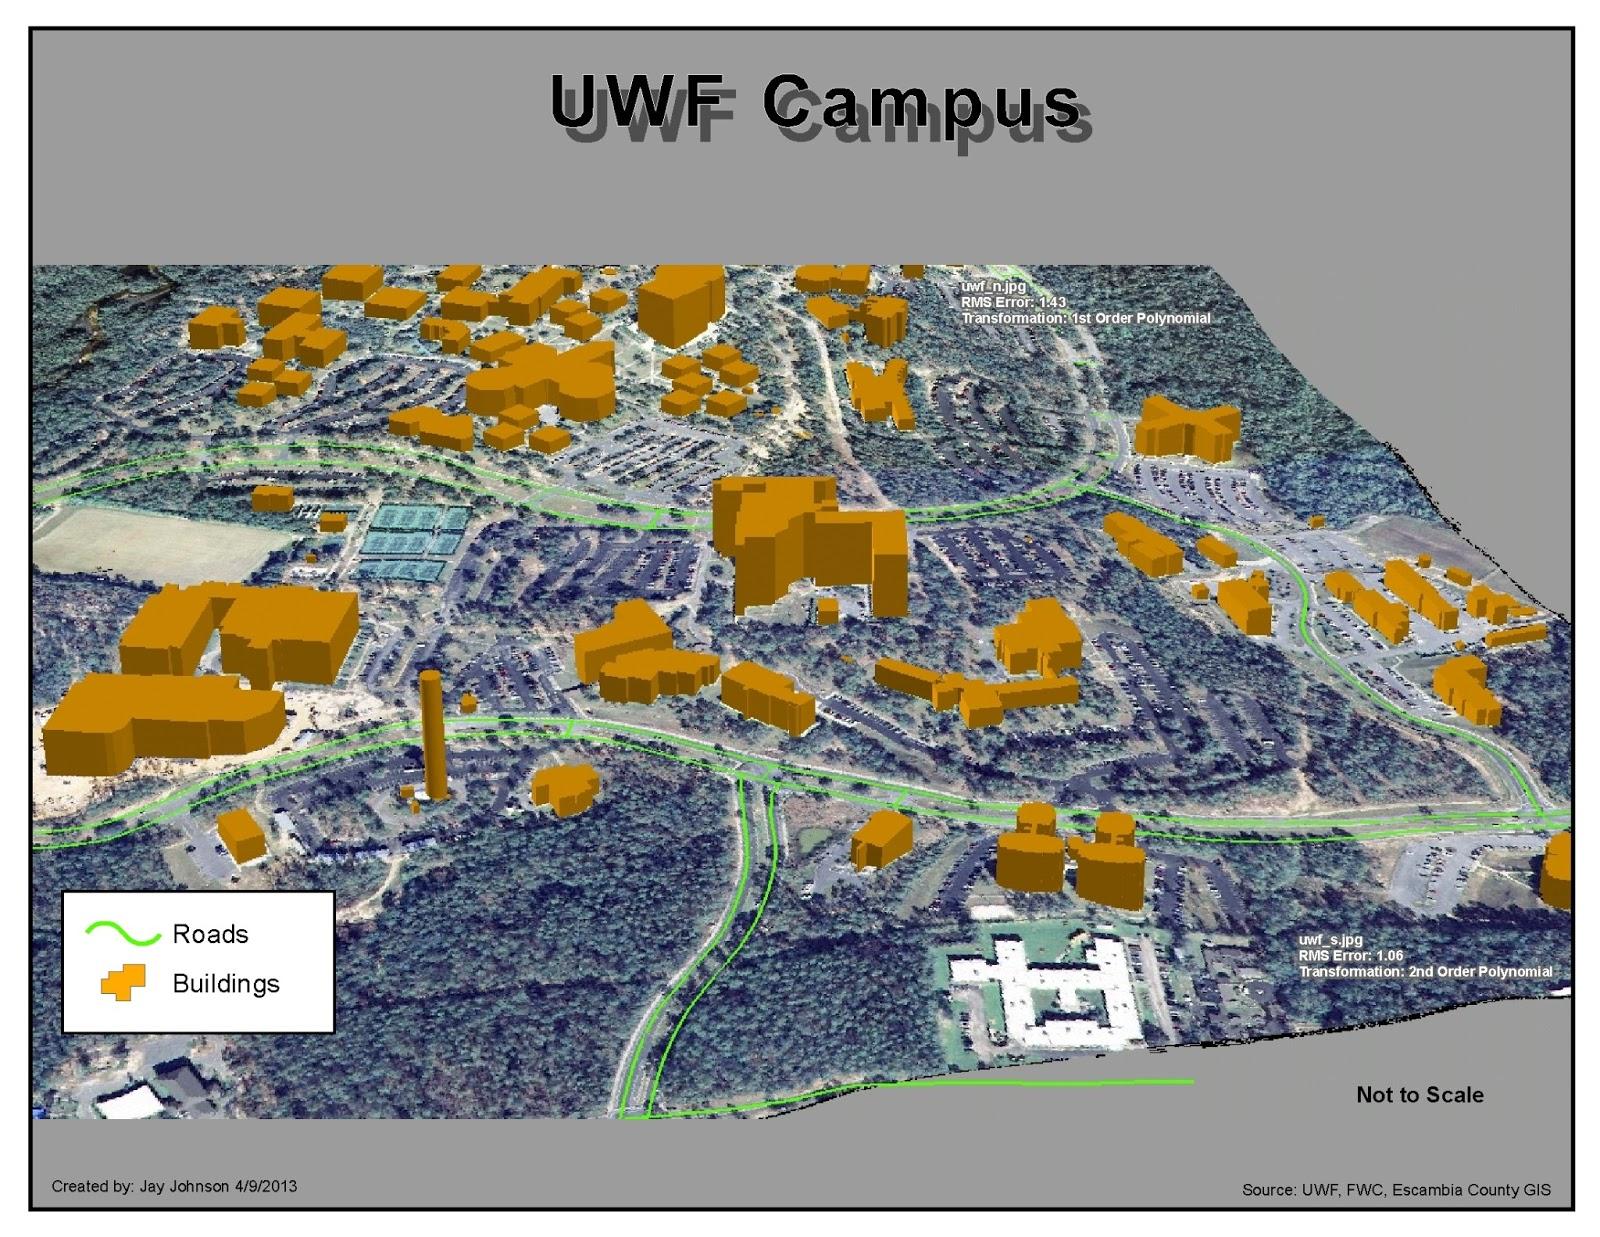 Jay Johnson 39 s UWF GIS Blog Georeferencing Editing ArcScene